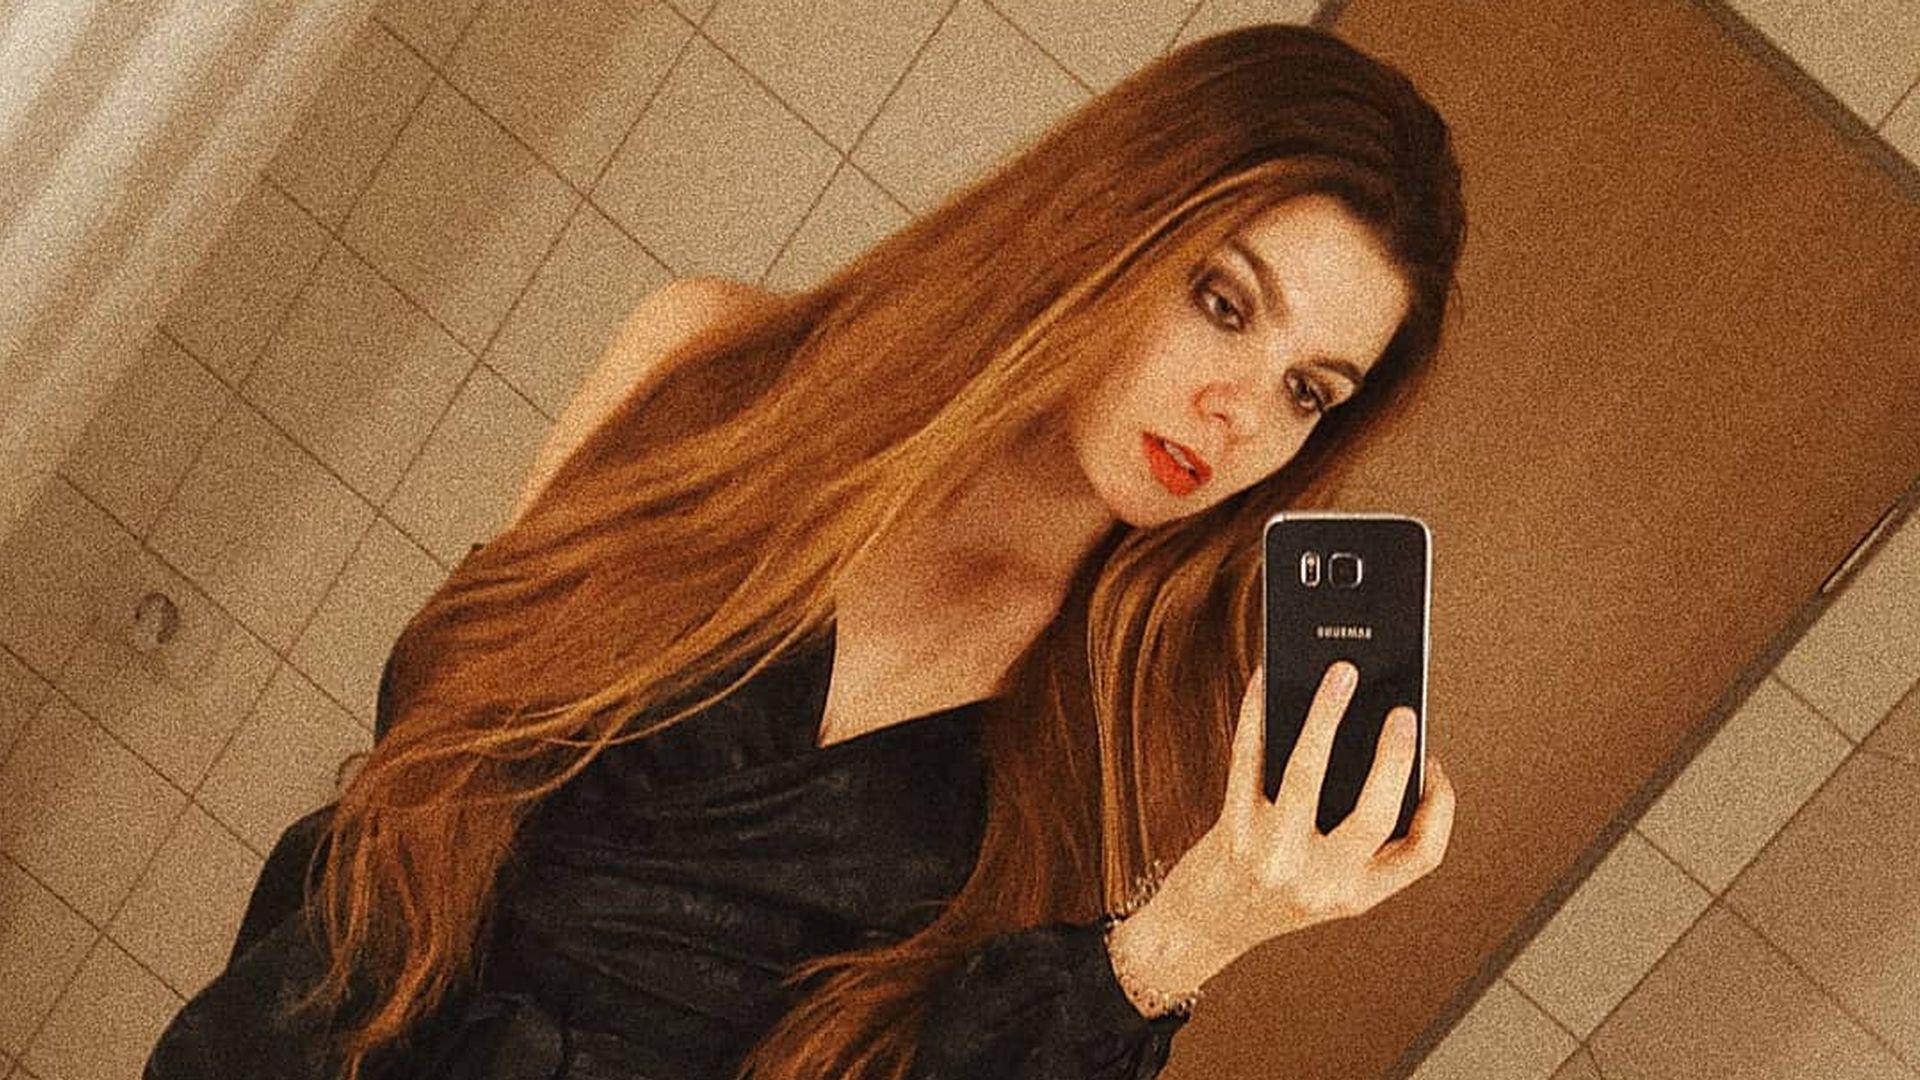 Klaudia K Instagram